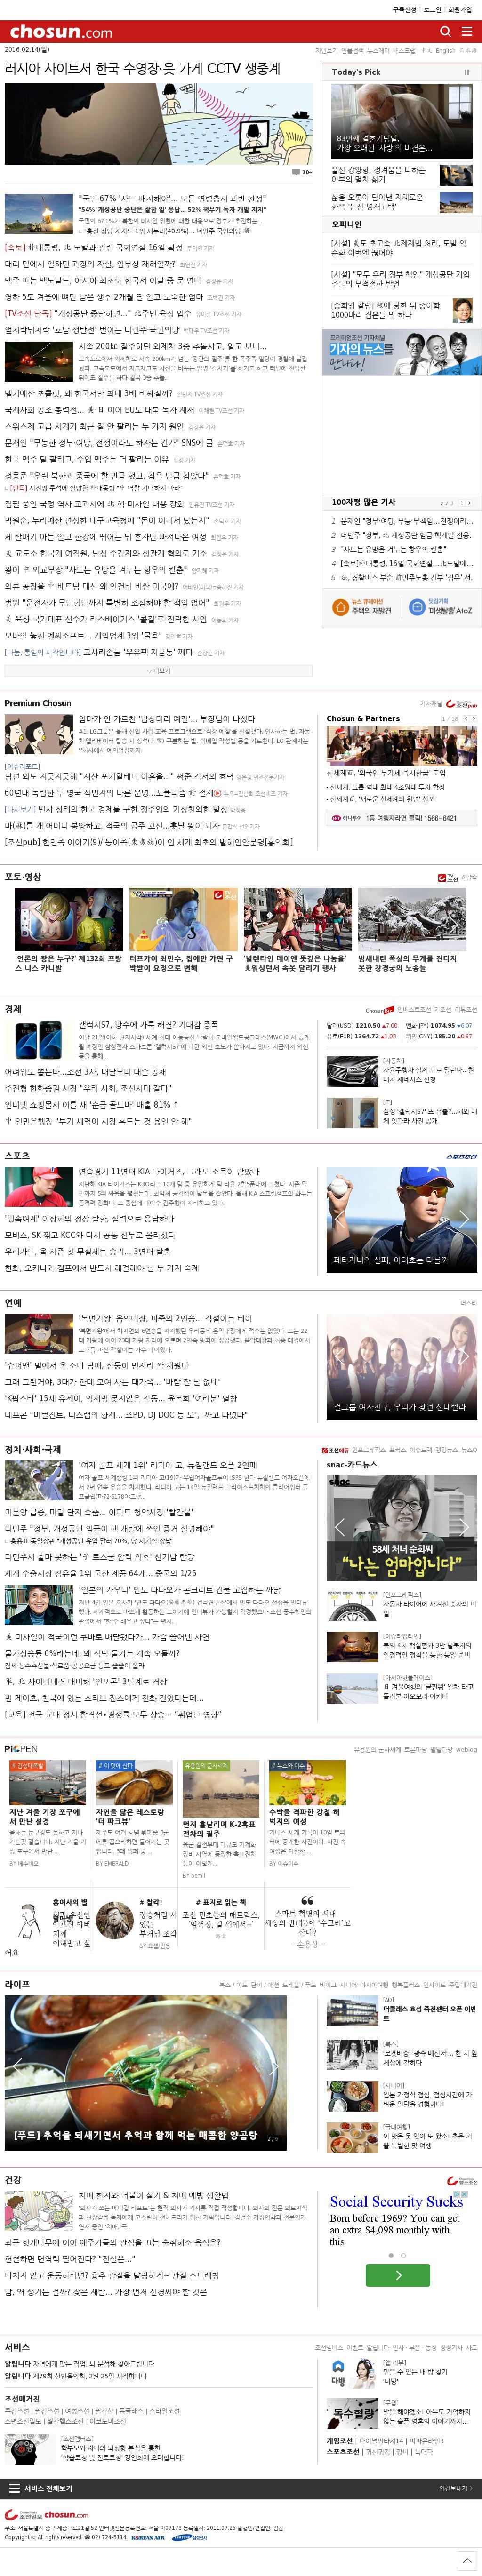 chosun.com at Sunday Feb. 14, 2016, 2:02 p.m. UTC